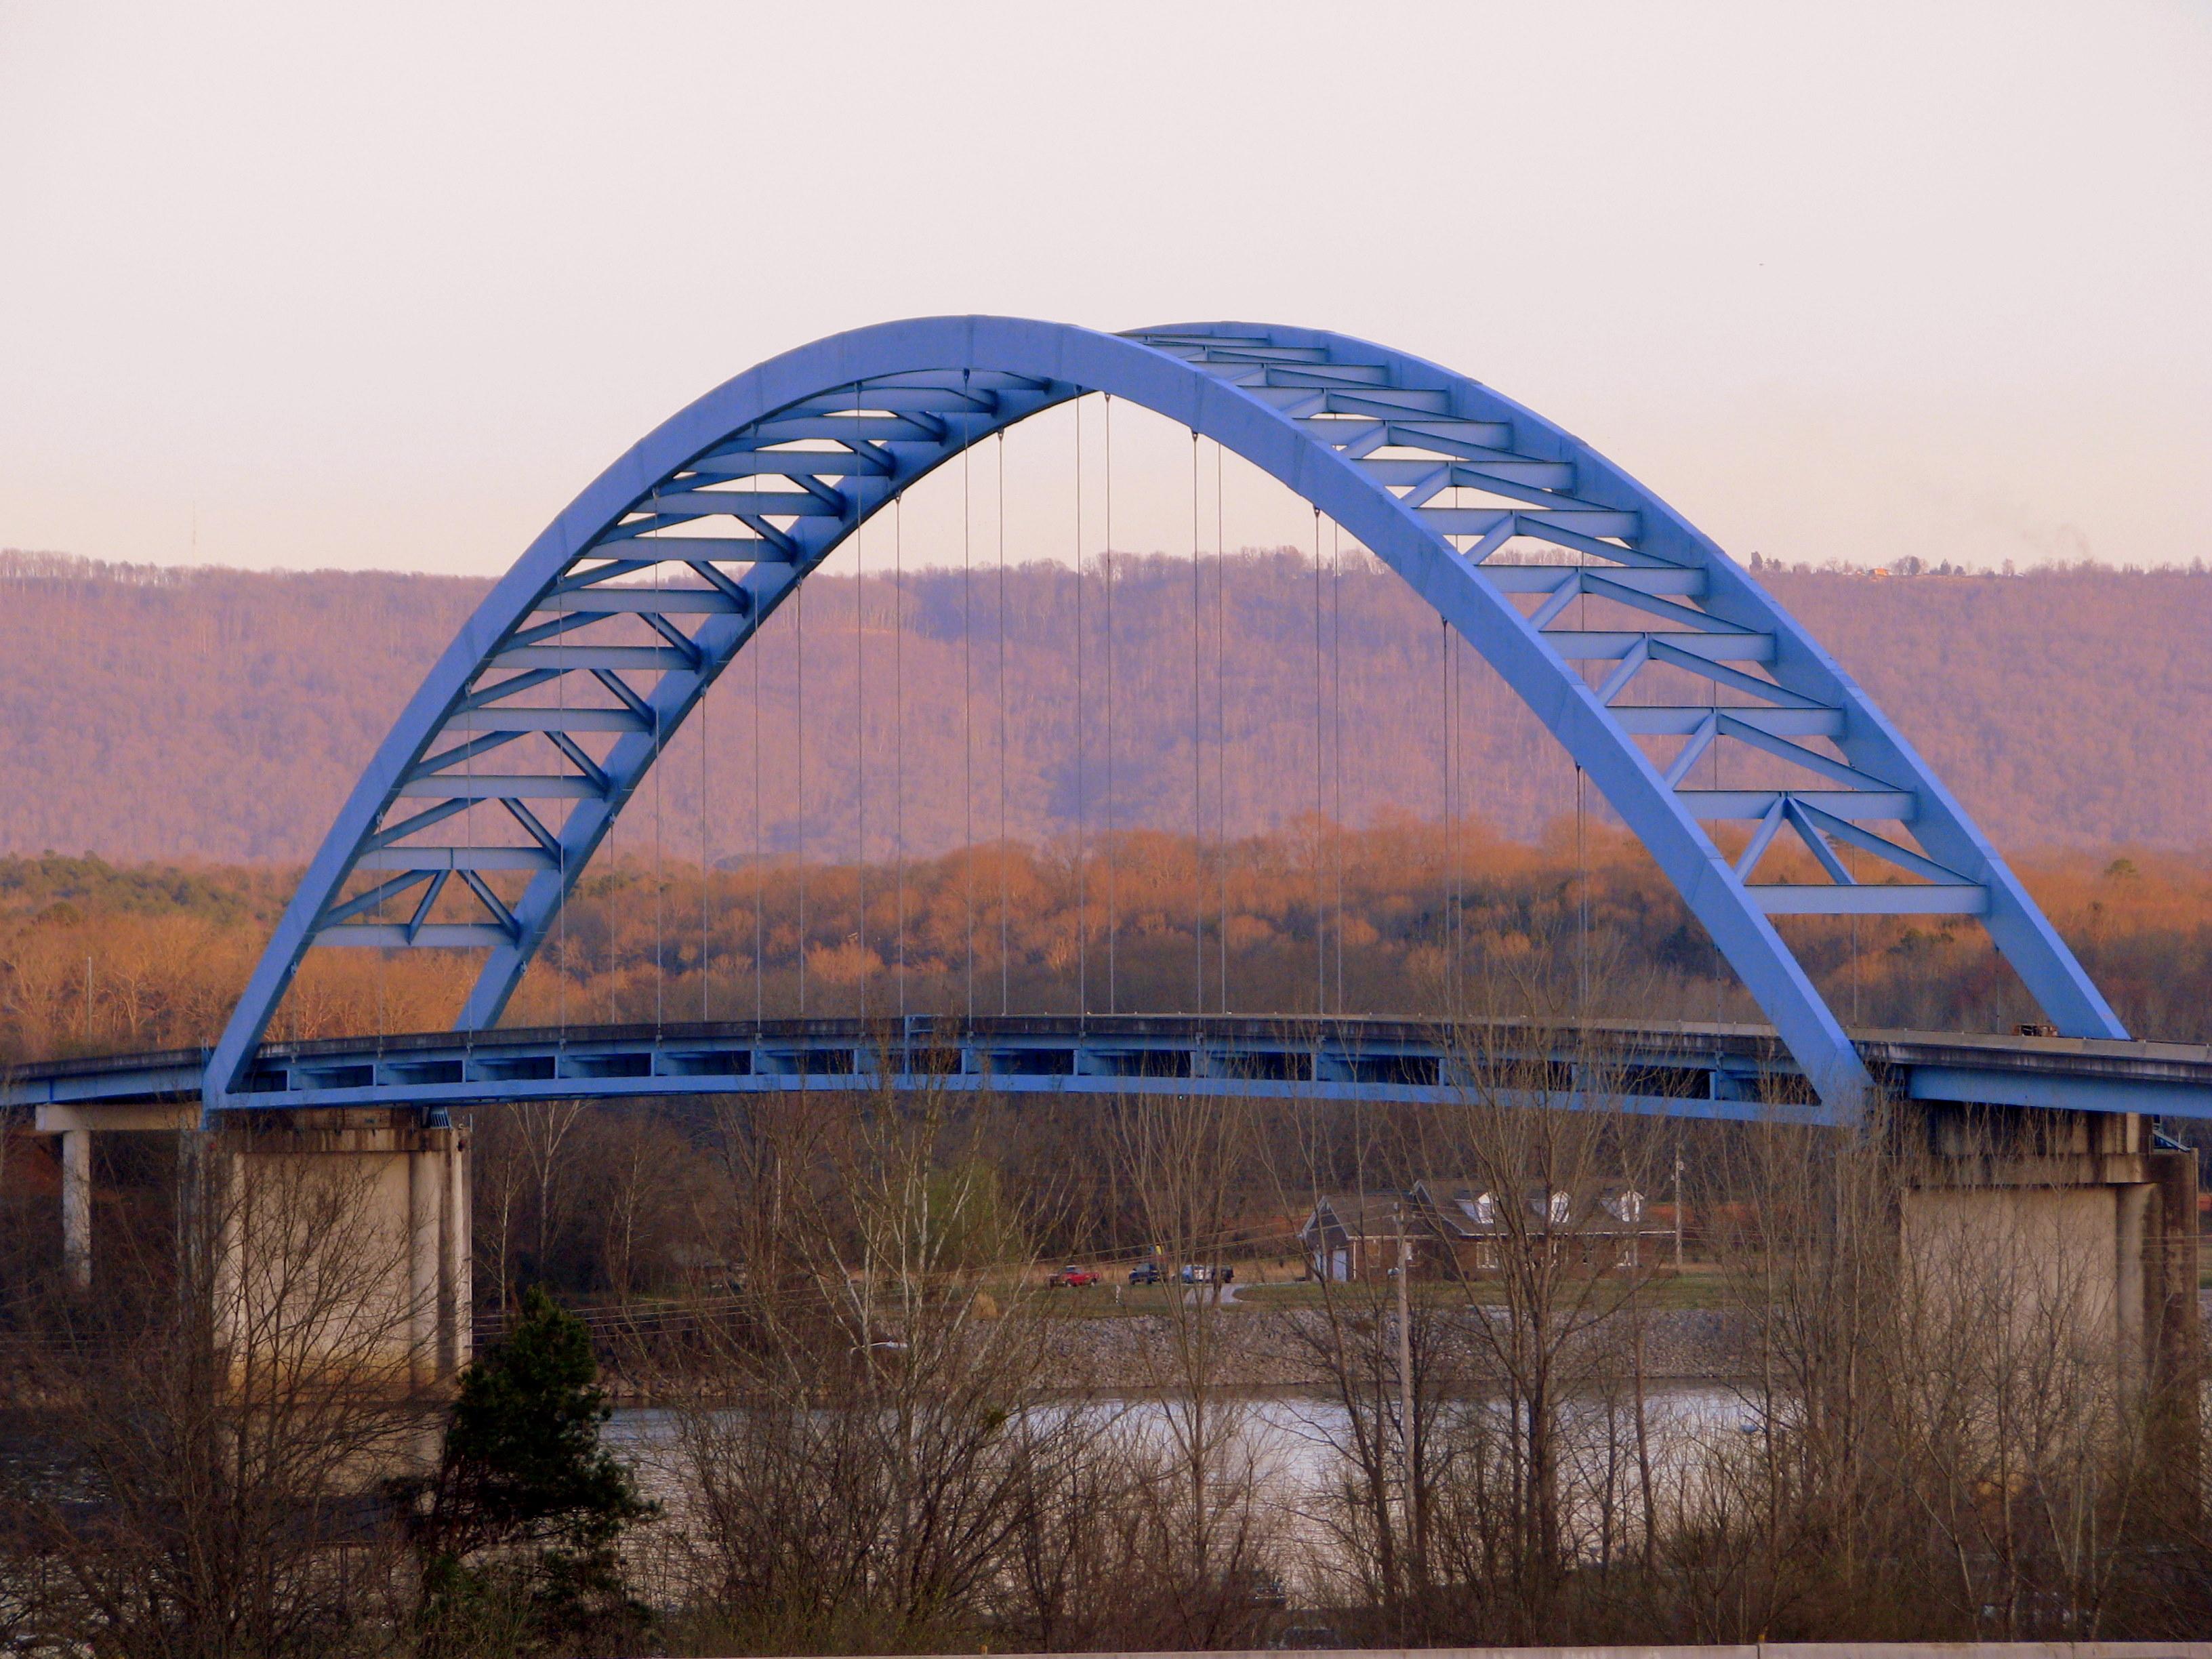 Tennessee marion county sequatchie - Bridge Tn Tennessee Tennesseeriver Bluebridge Marioncounty Archbridge Southpittsburgh Bmok Tn156 Shelbyreinhartbridge Shelbyrhinehartbridge